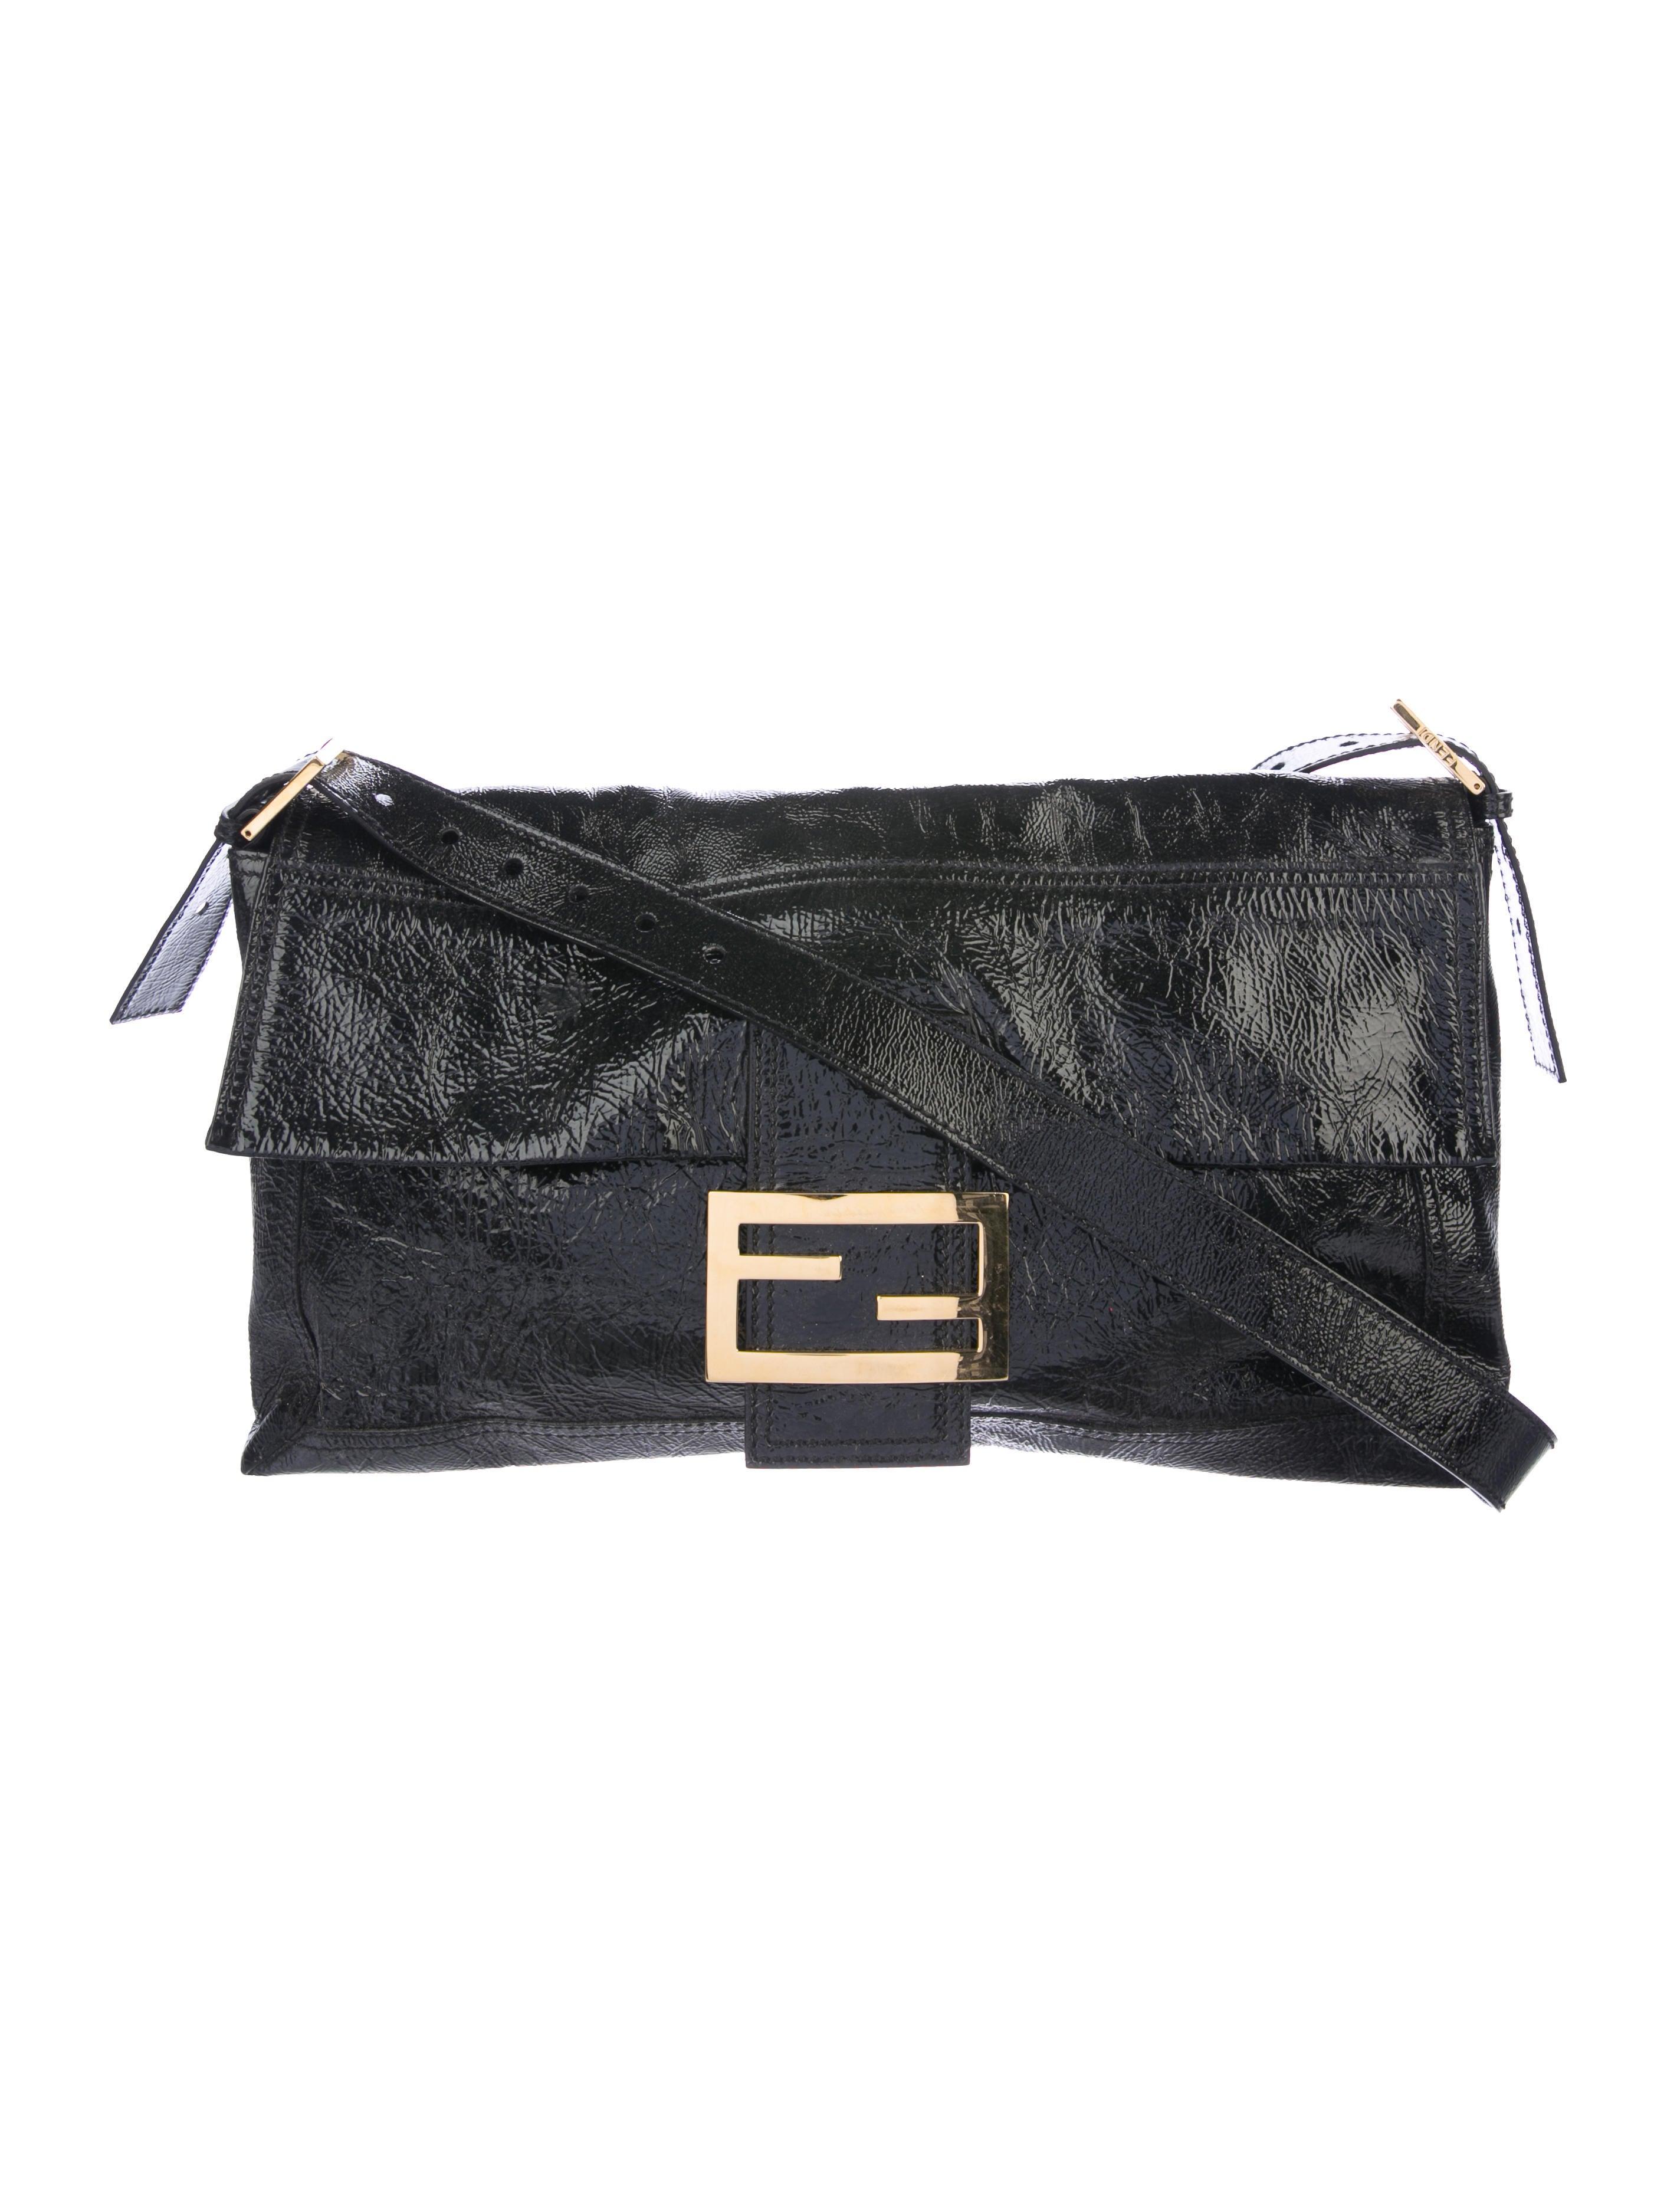 f6afa98abd2e Fendi Patent Leather Messenger Bag - Handbags - FEN70926